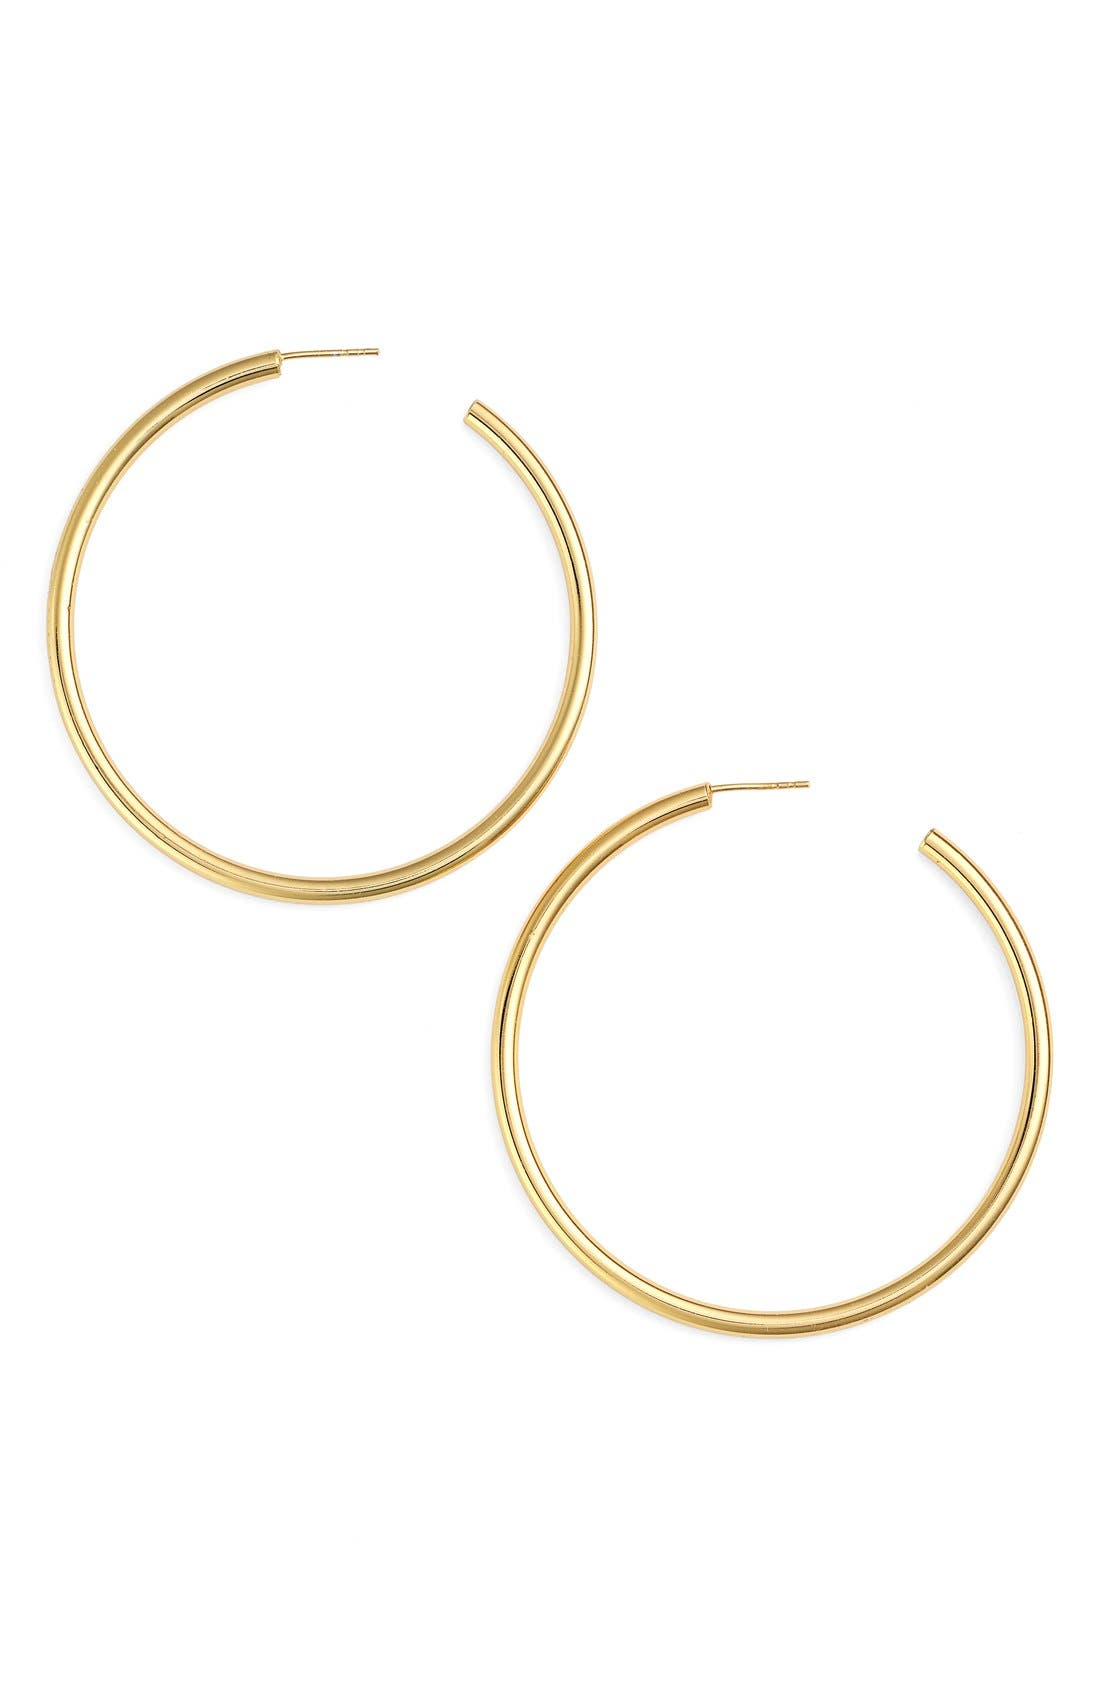 Tubular Hoop Earrings,                             Main thumbnail 1, color,                             GOLD